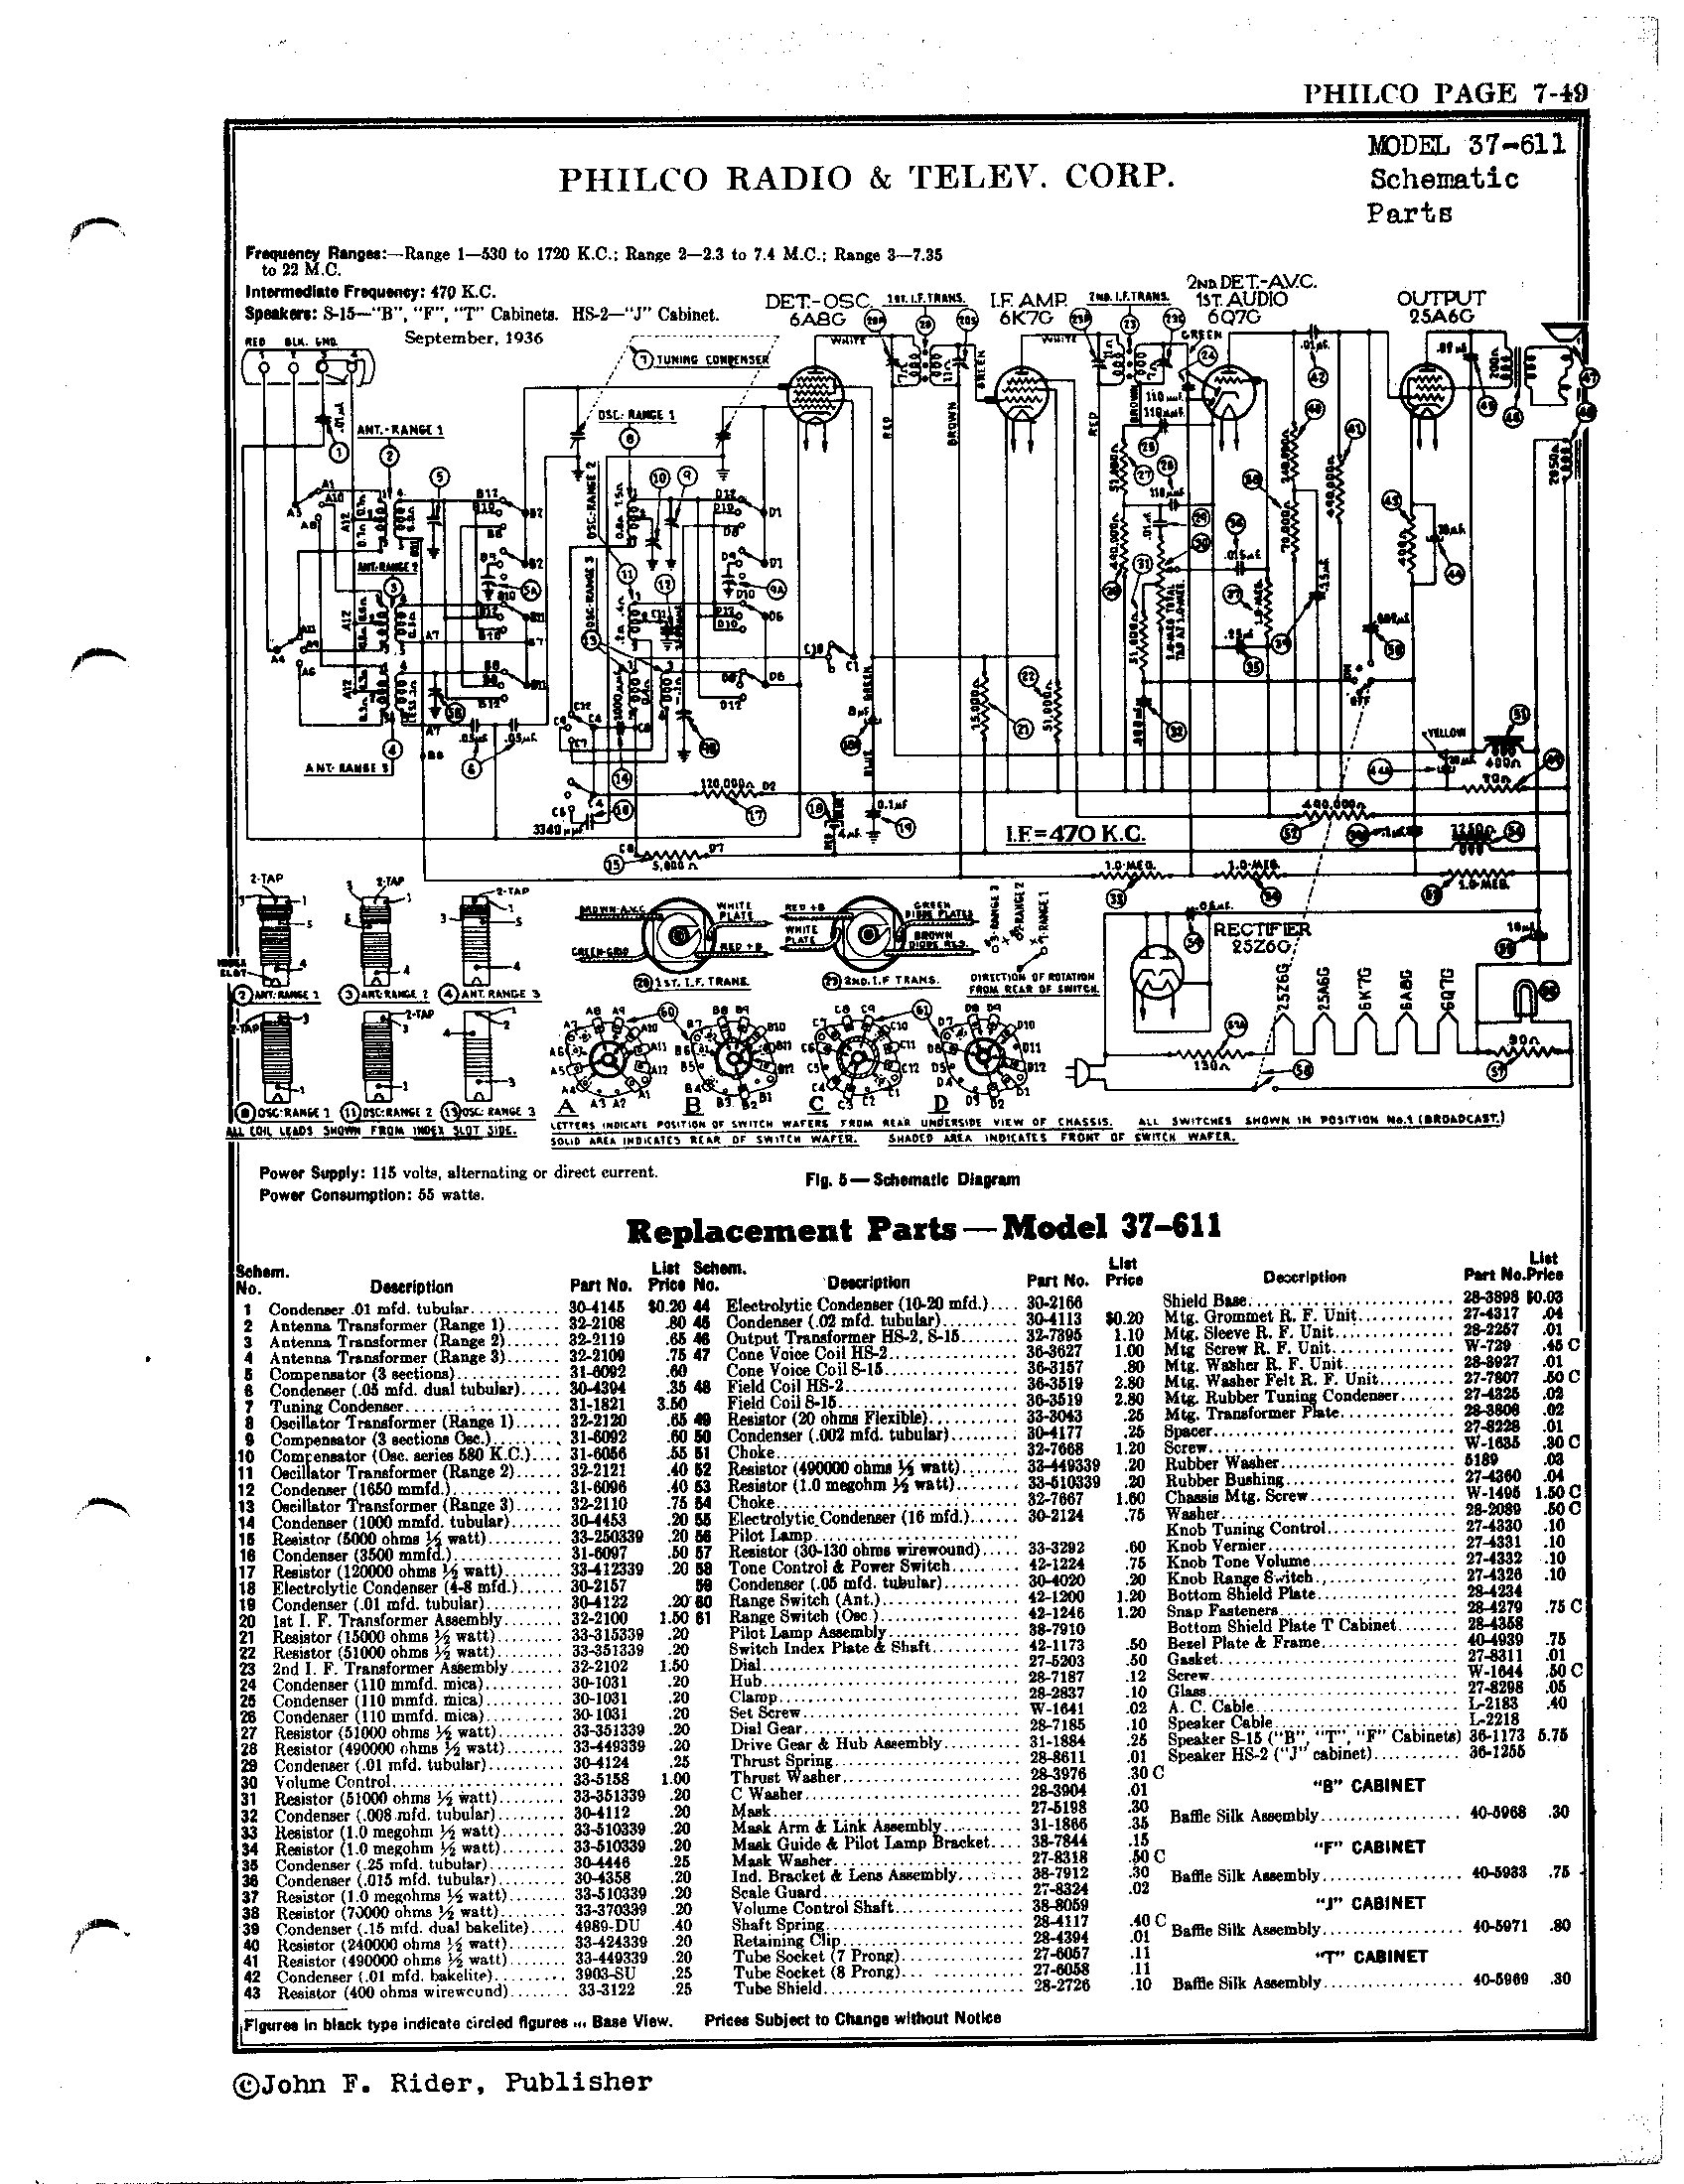 Philco Radio & Television Corp. 37-611 | Antique Electronic Supply